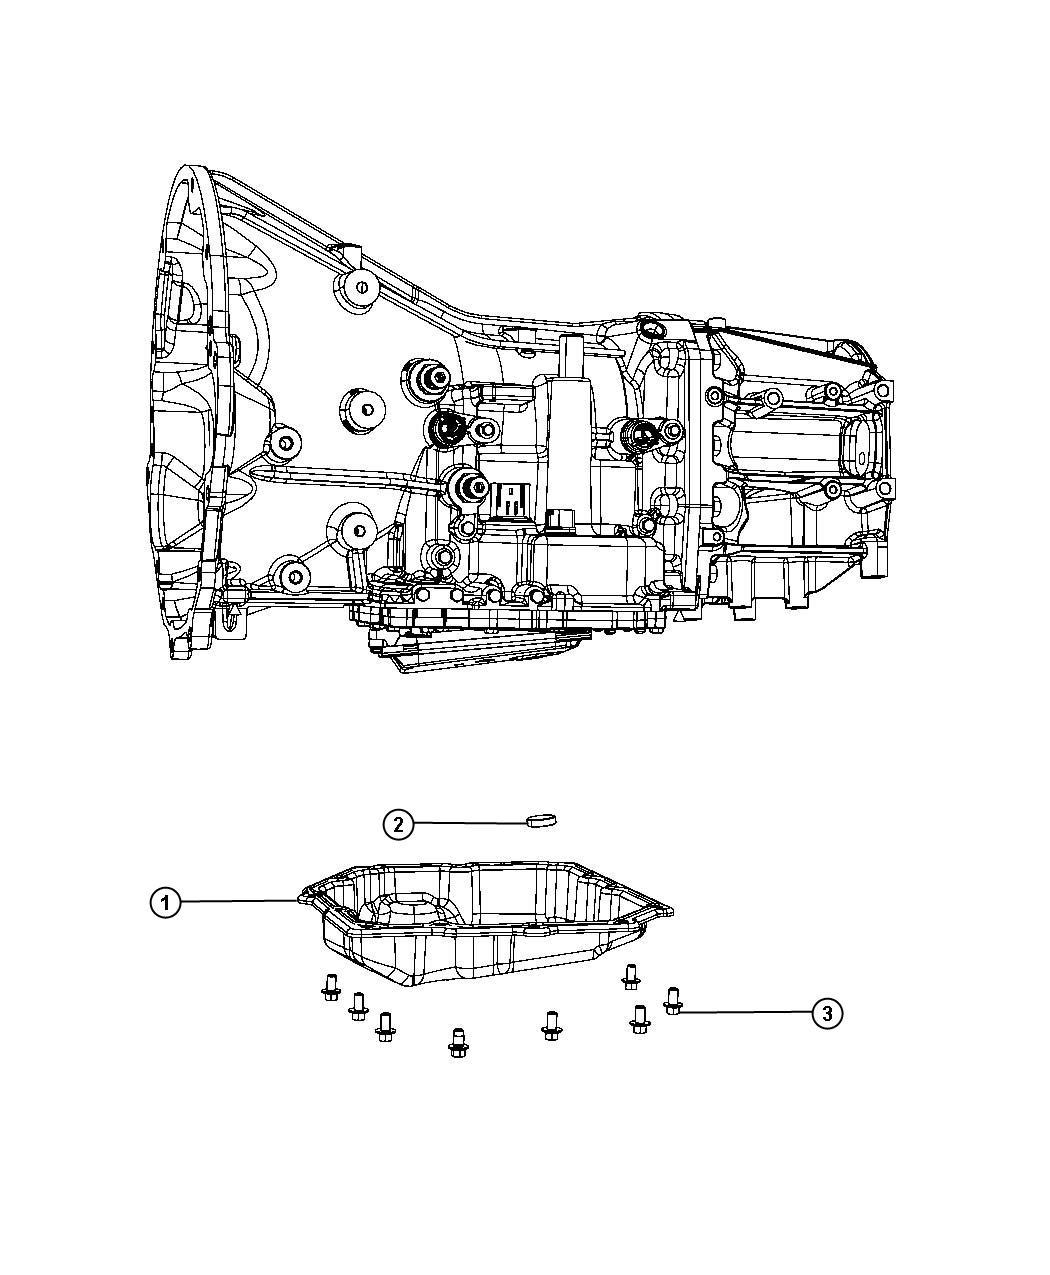 Snap Oem Chrysler Jeep Dodge Ram Parts Online Factory Autos Post 2012 1500